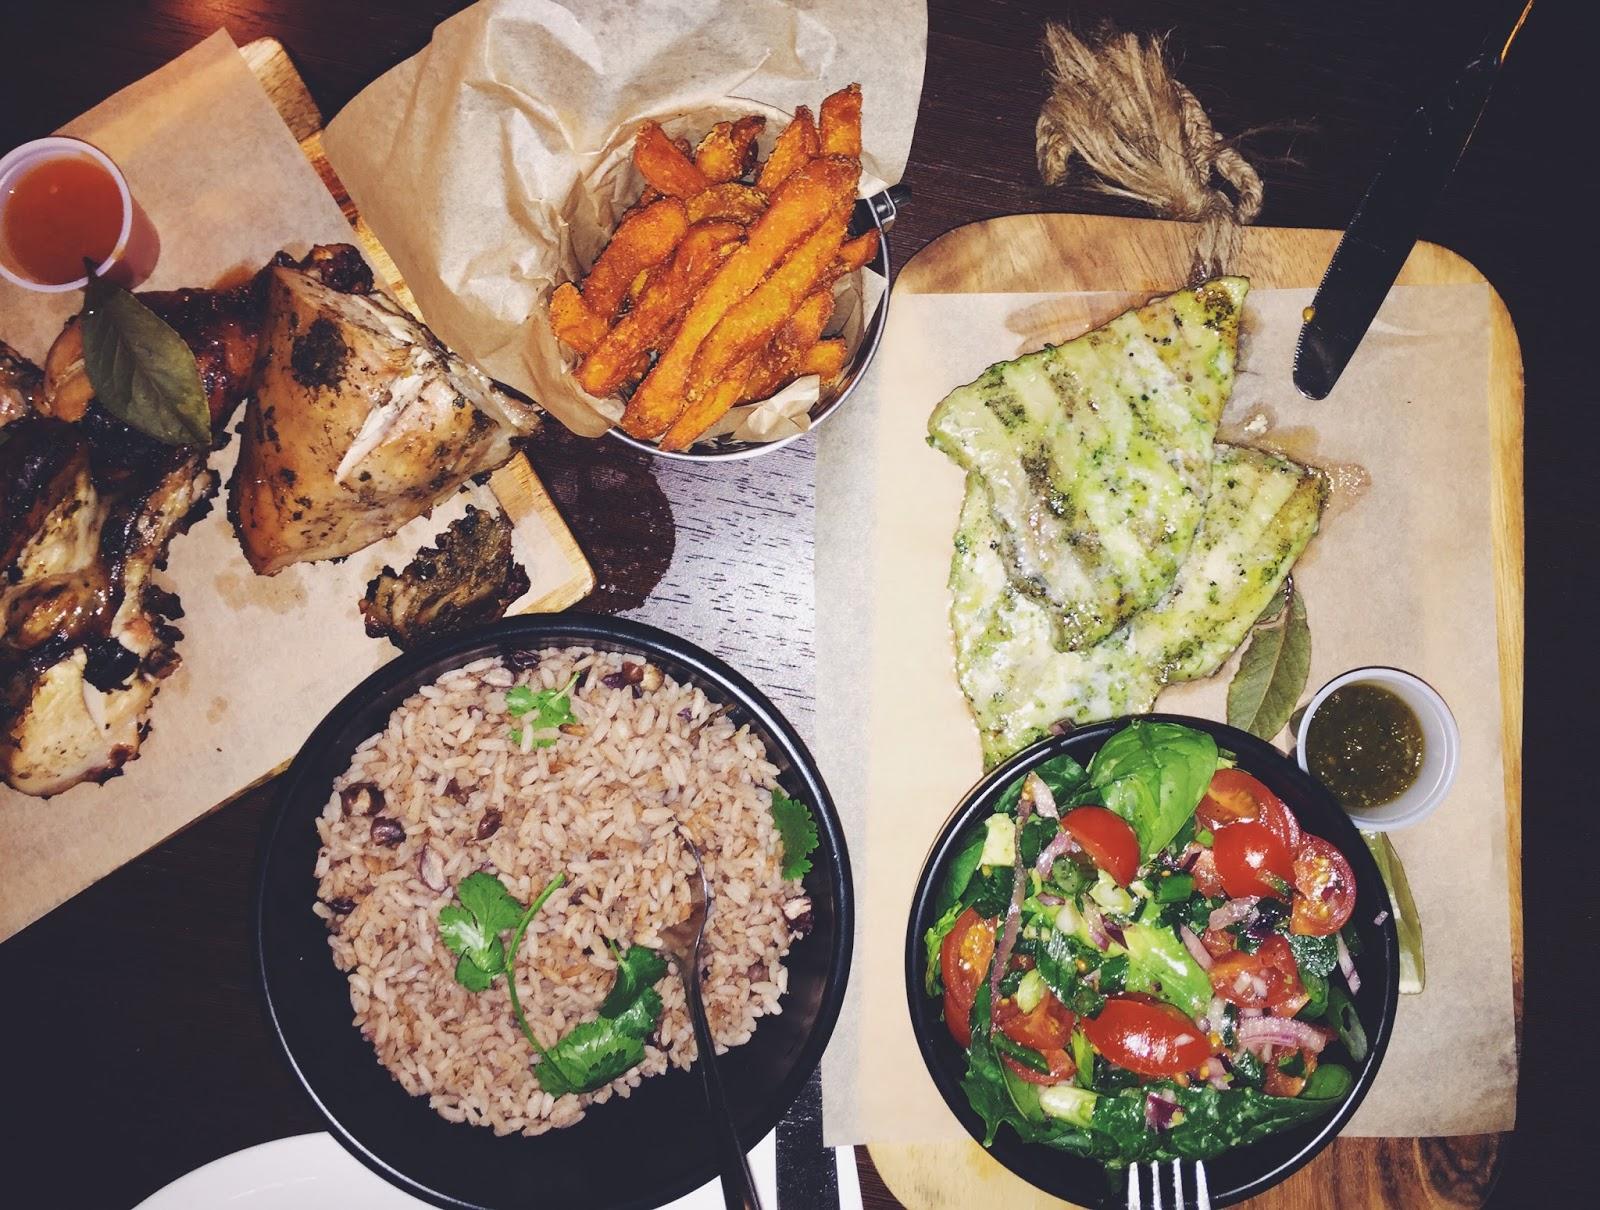 Rudie's: Food that takes you miles away